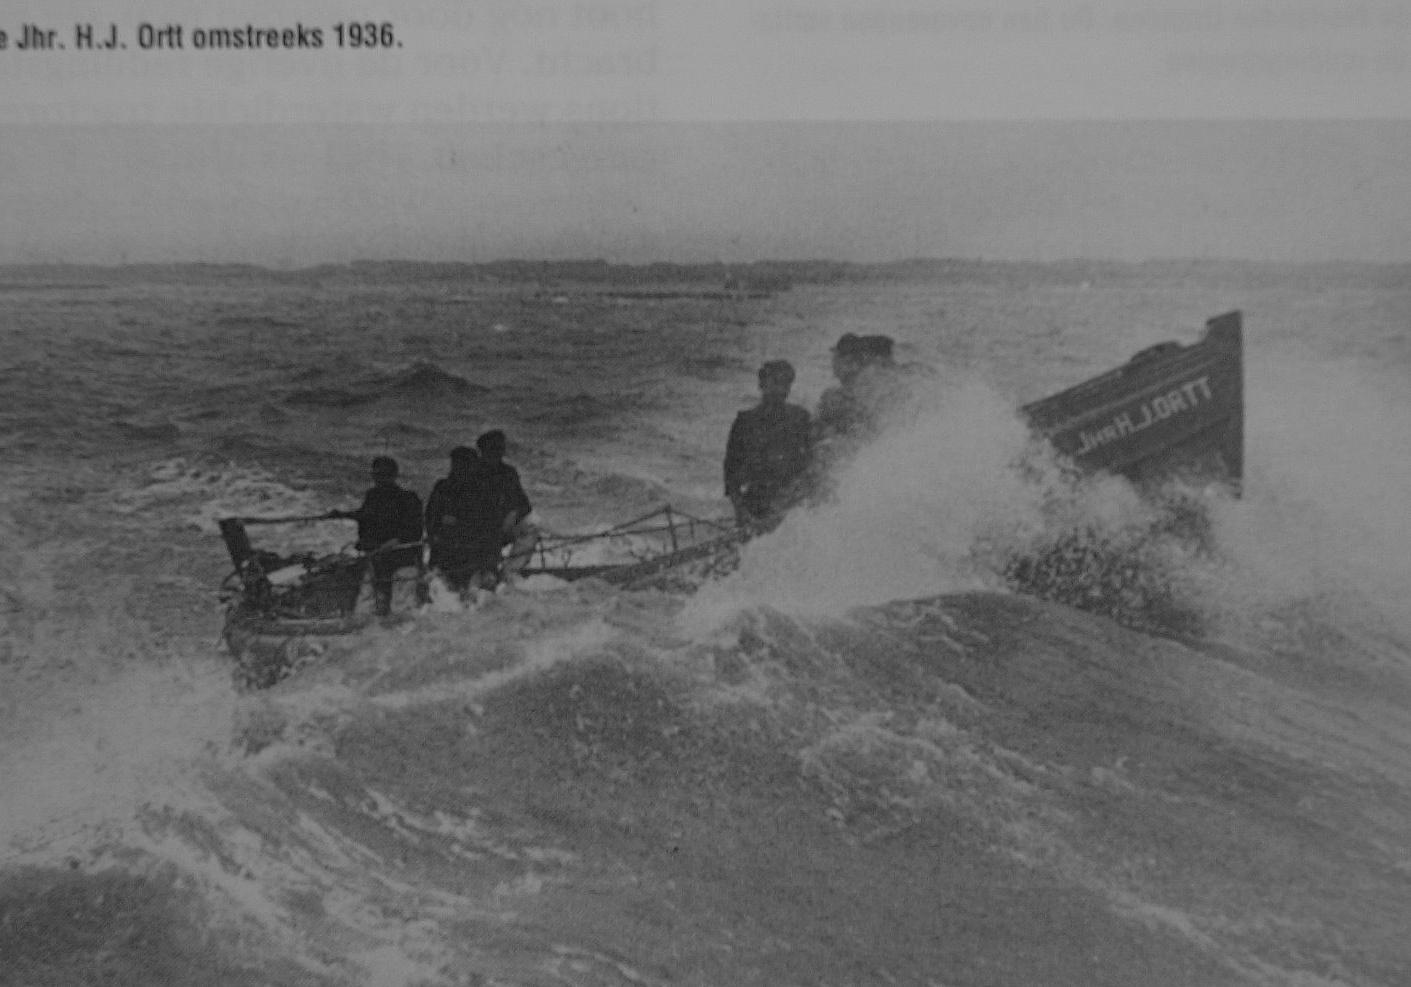 Historische reddingboot Jhr. H.J. Ortt 1936